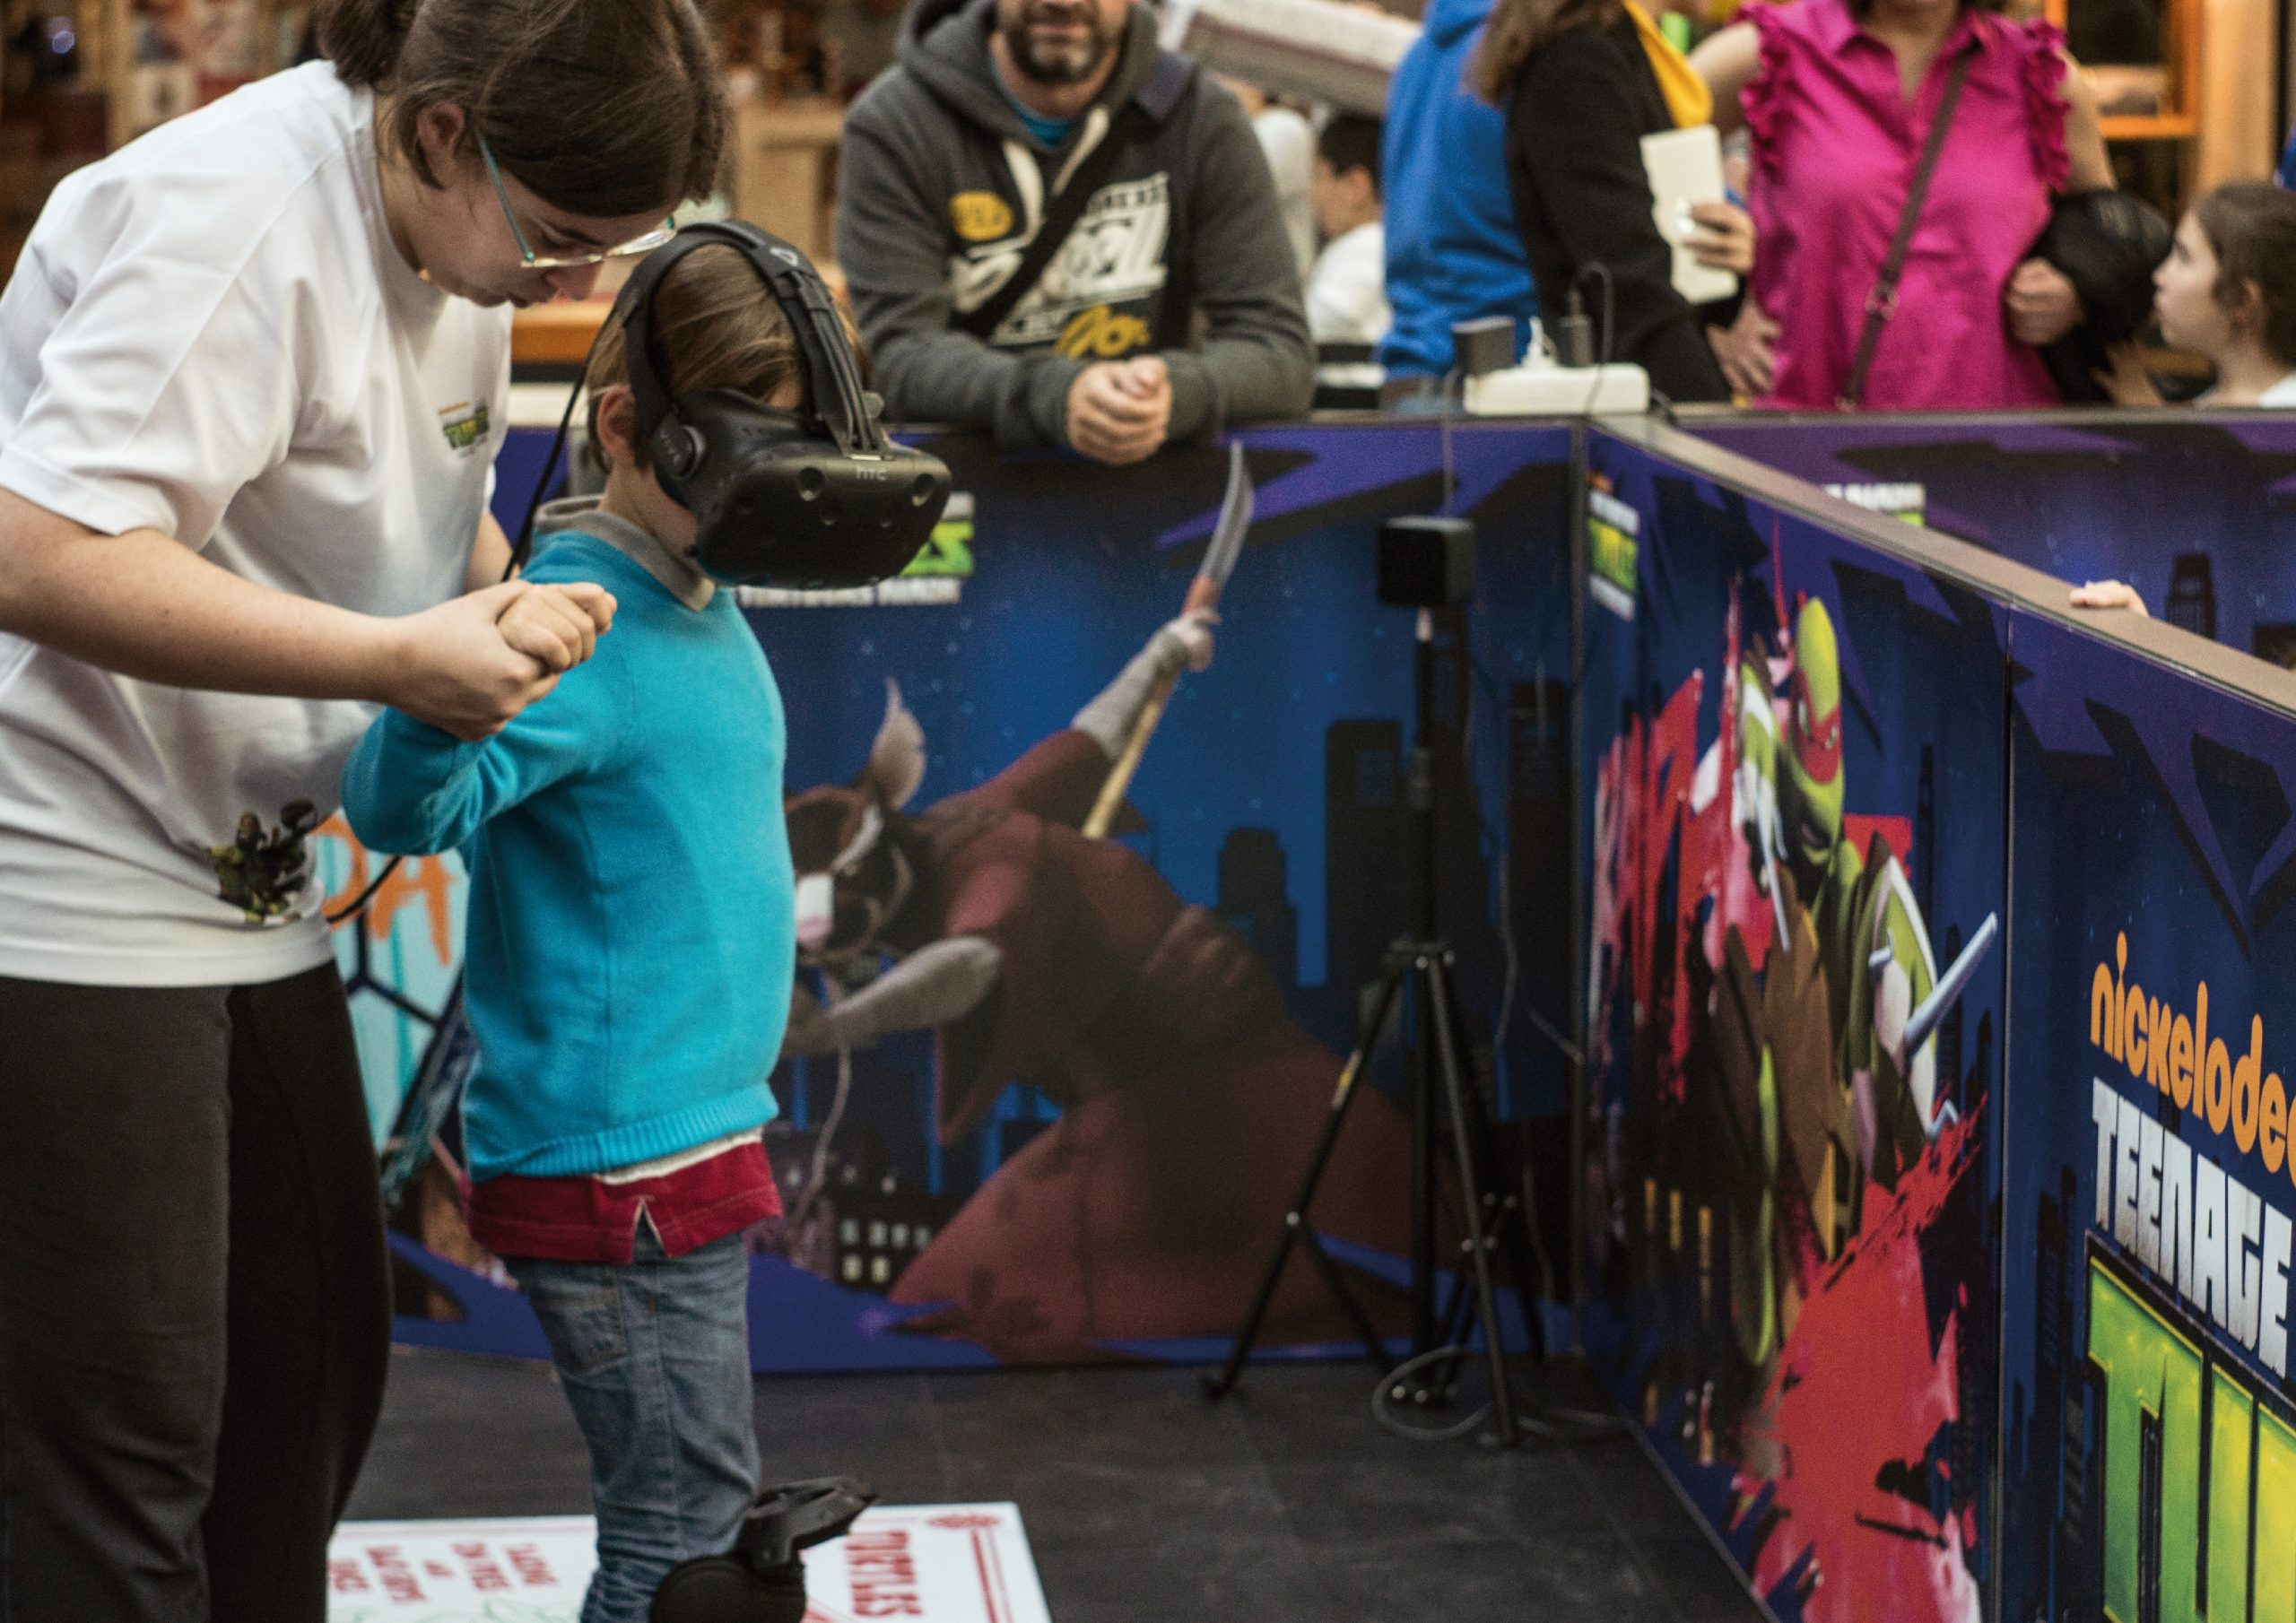 TEENAGE MUTANT NINJA TURTLES VR TOUR – NICKELODEON